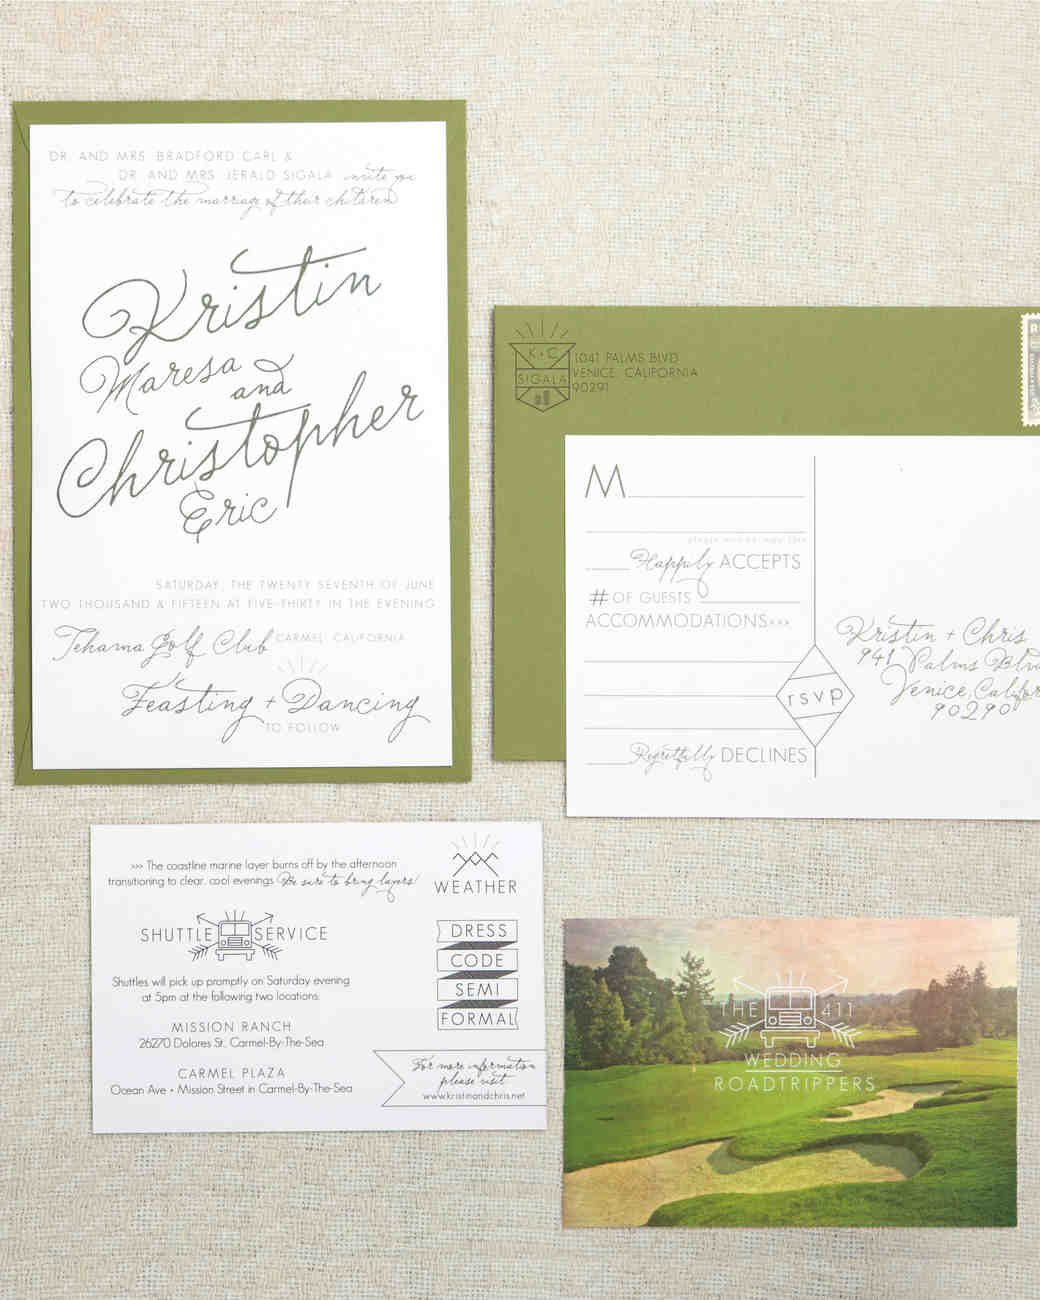 kristin-chris-wedding-invite-501-s112398-0116.jpg